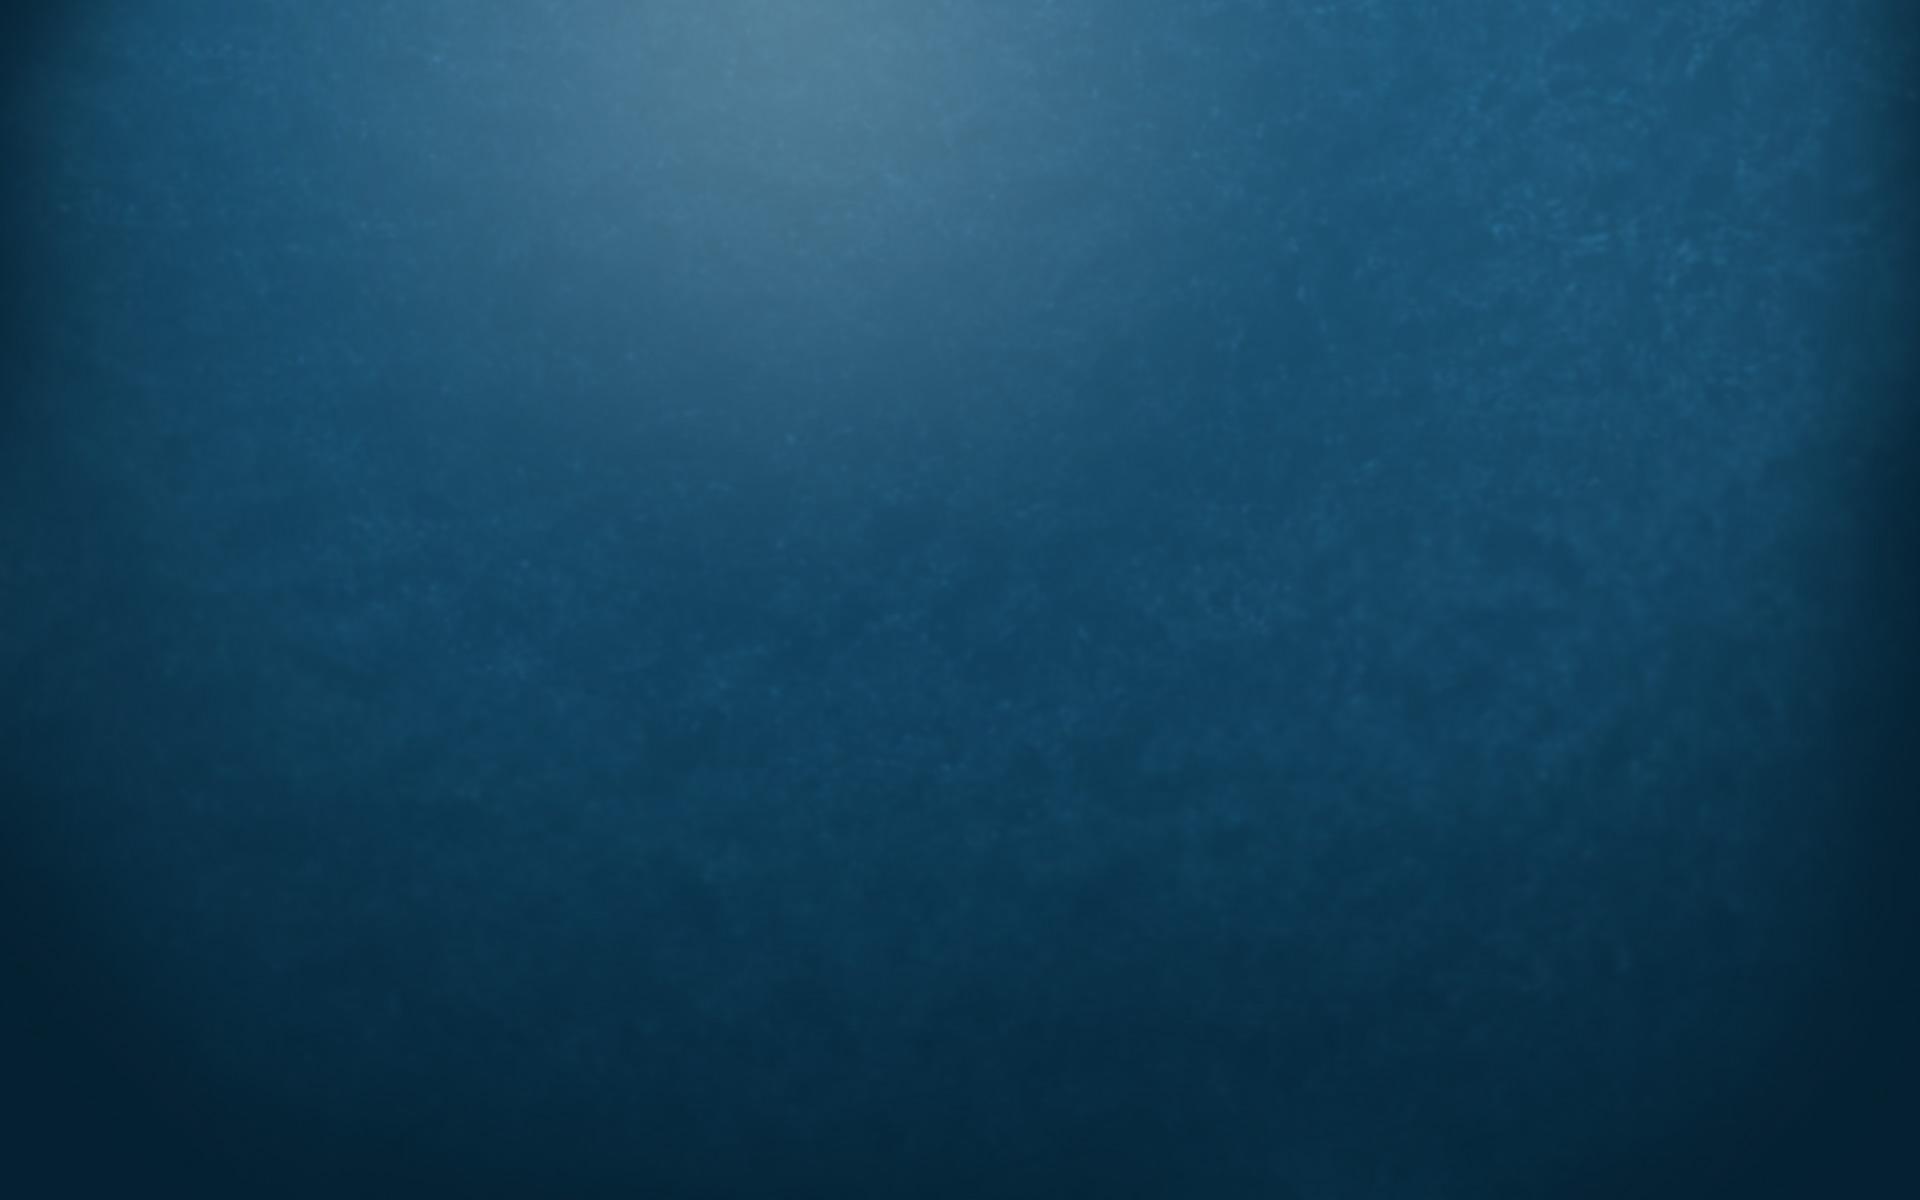 Plain Blue Backgrounds Wallpapers 1920x1200